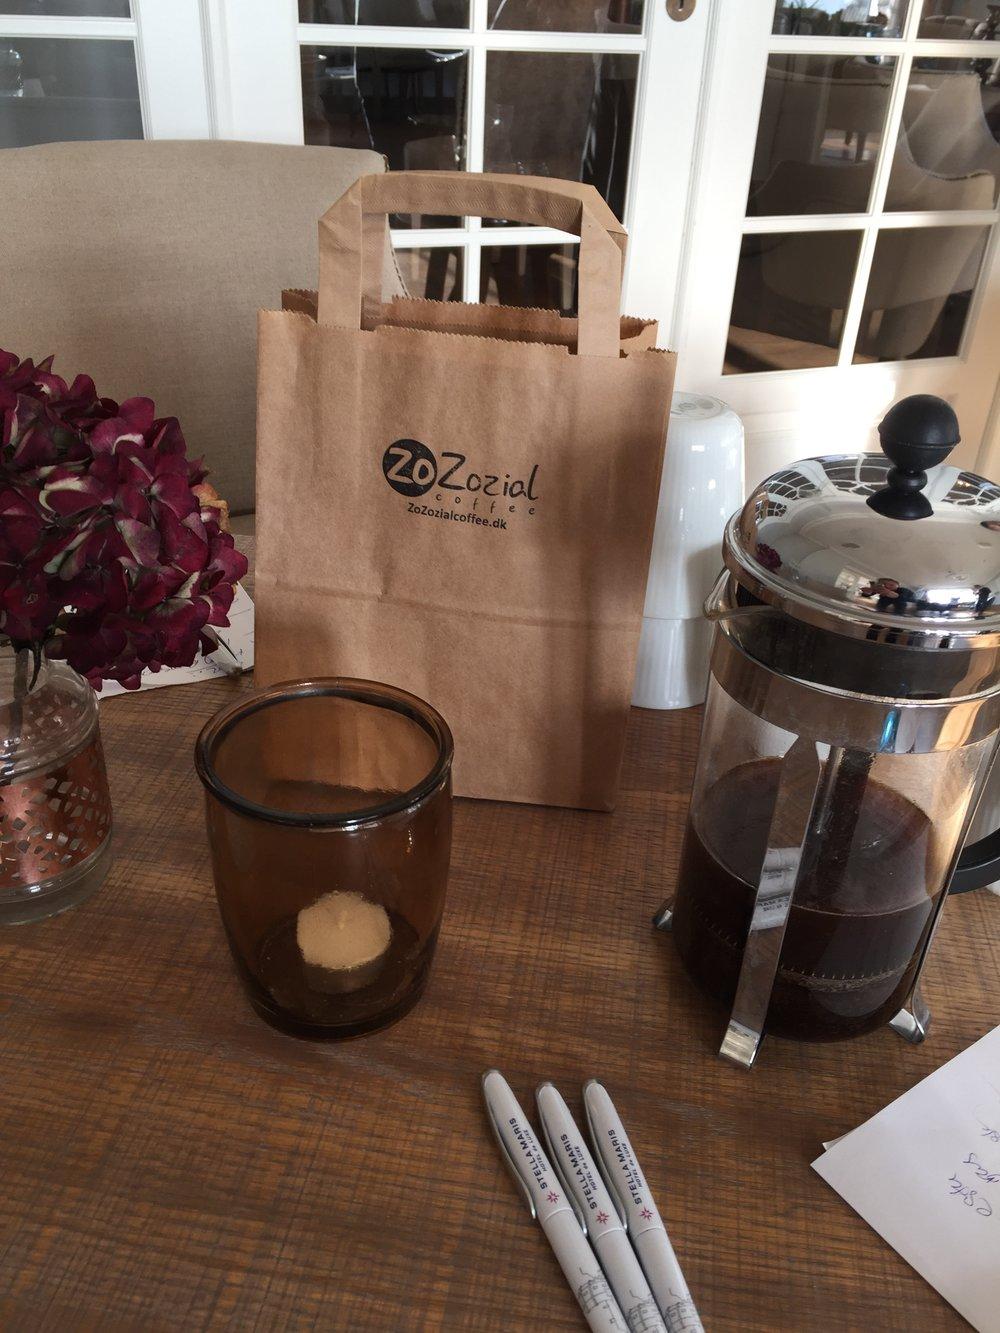 Stella Maris Hotel de Luxe får deres egen signaturkaffe